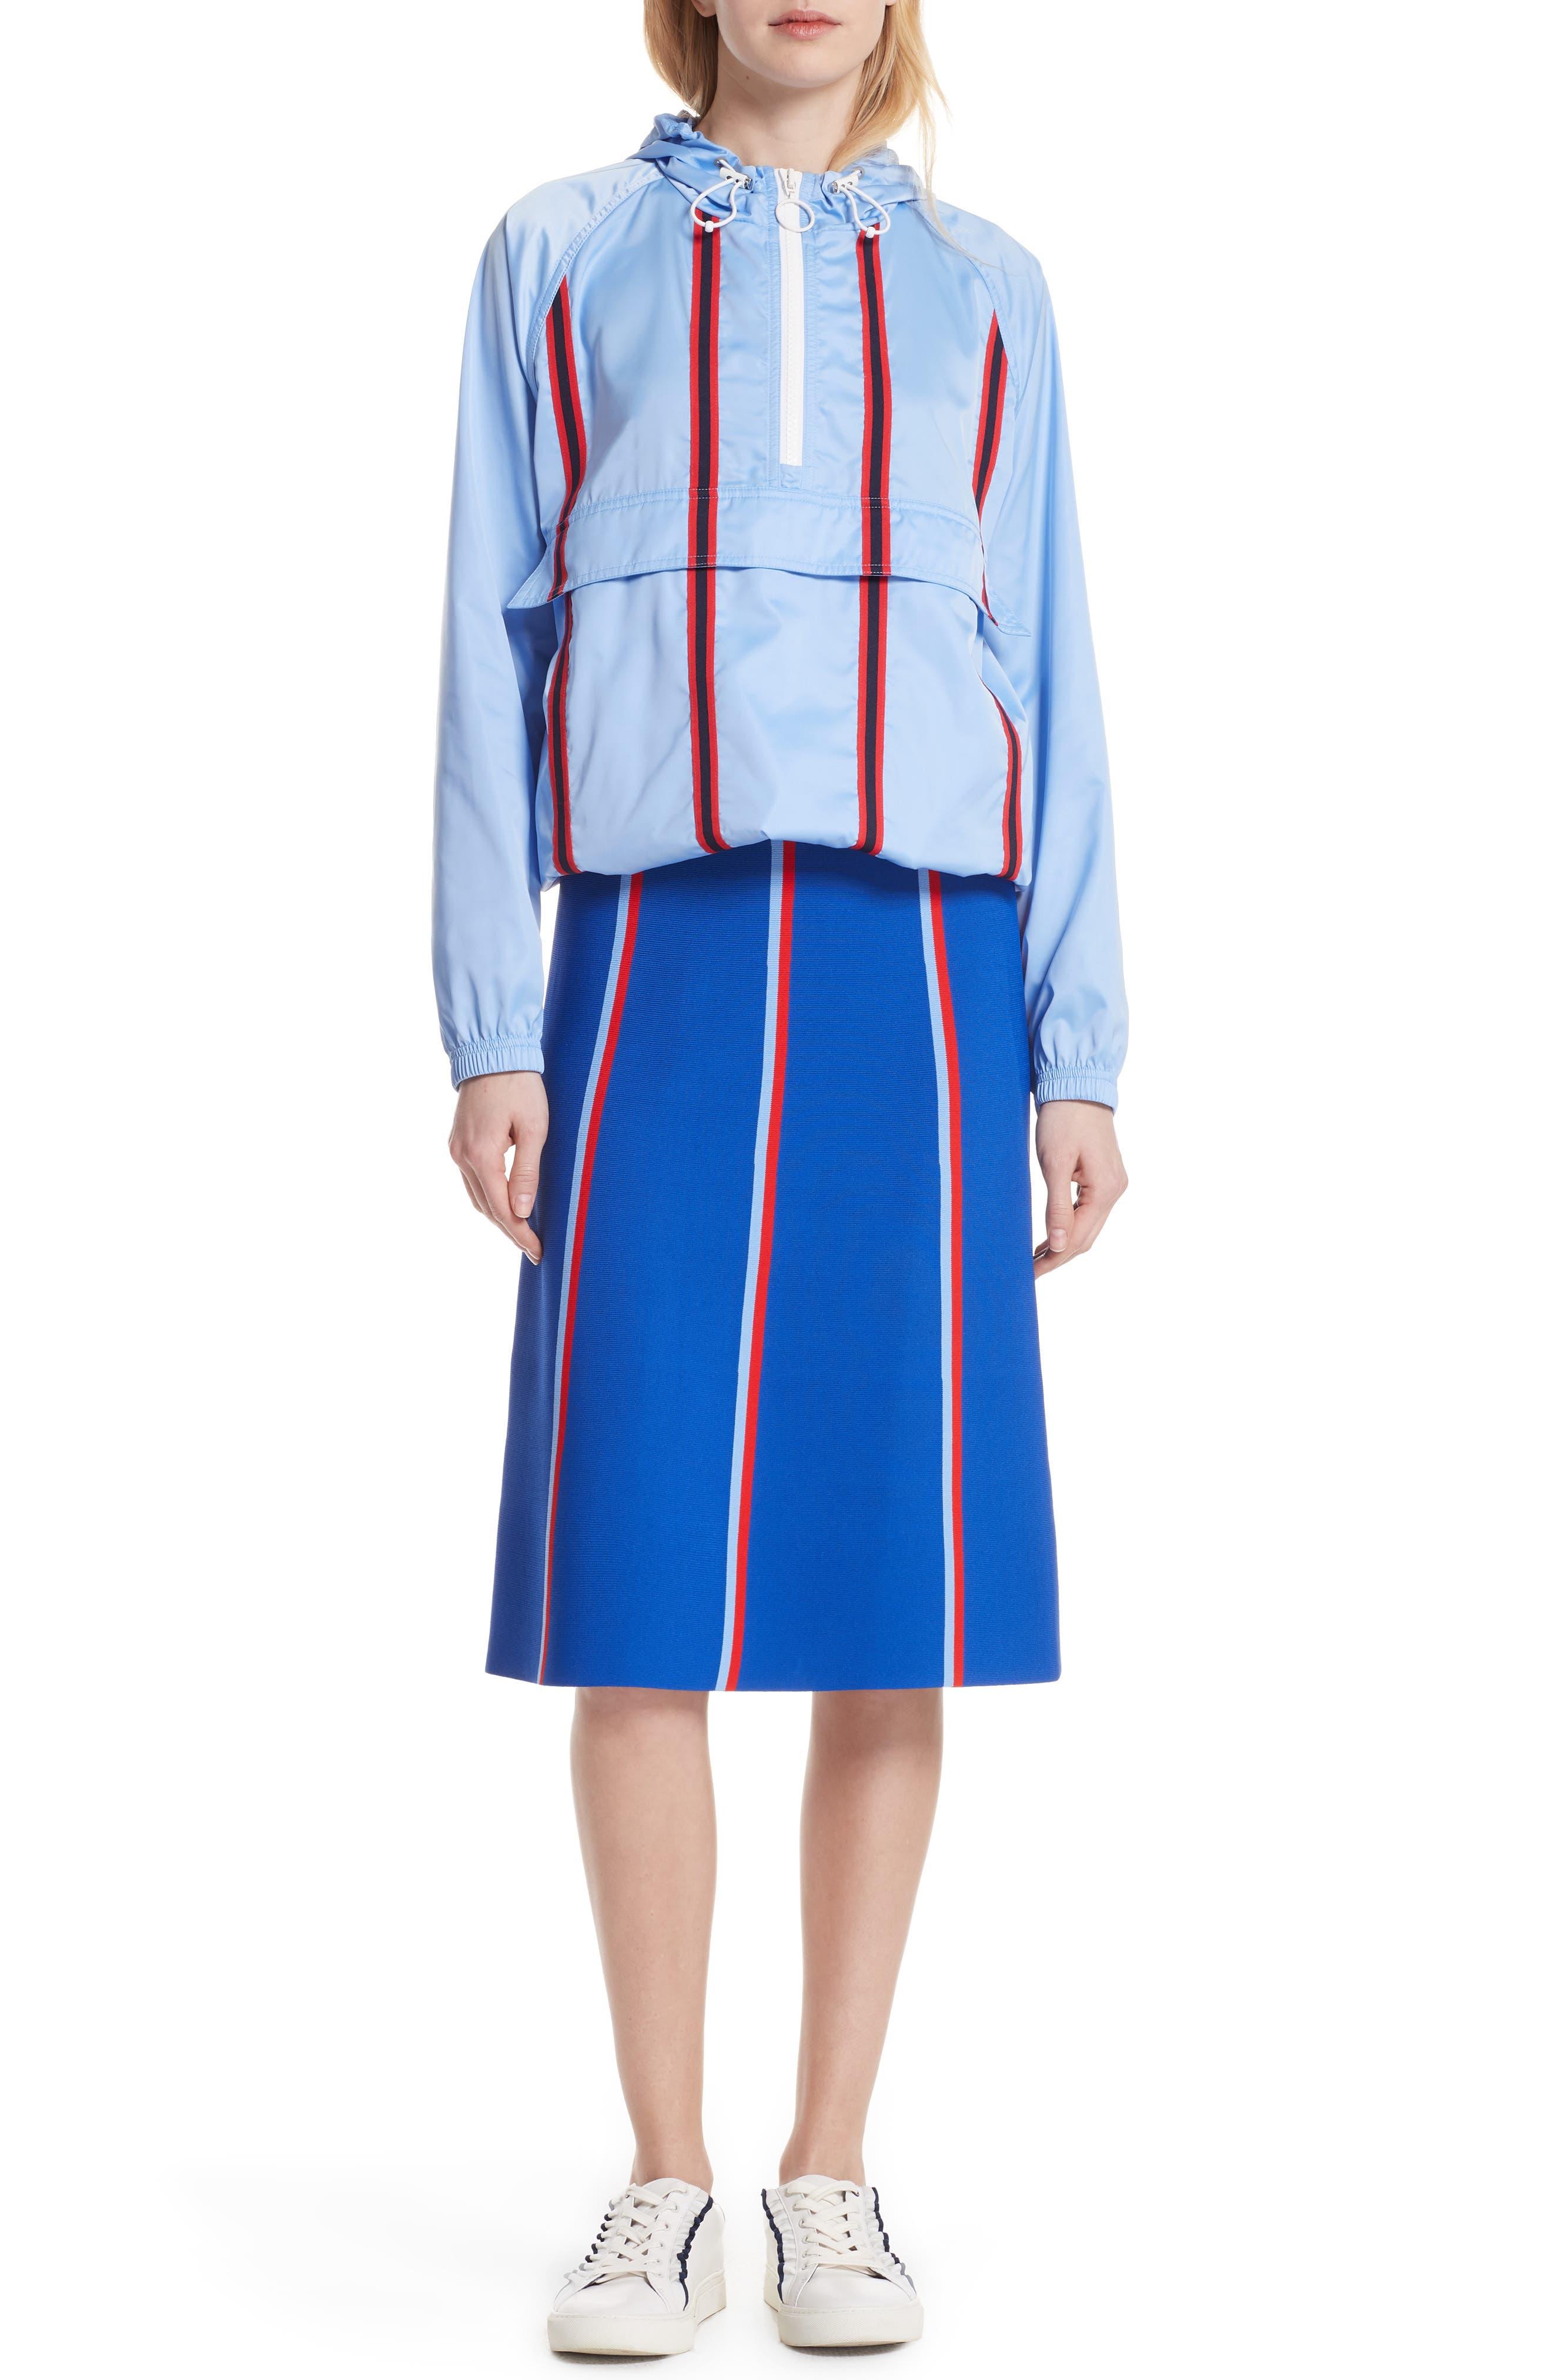 Twin Stripe Tech Knit Skirt,                             Alternate thumbnail 7, color,                             SLALOM BLUE